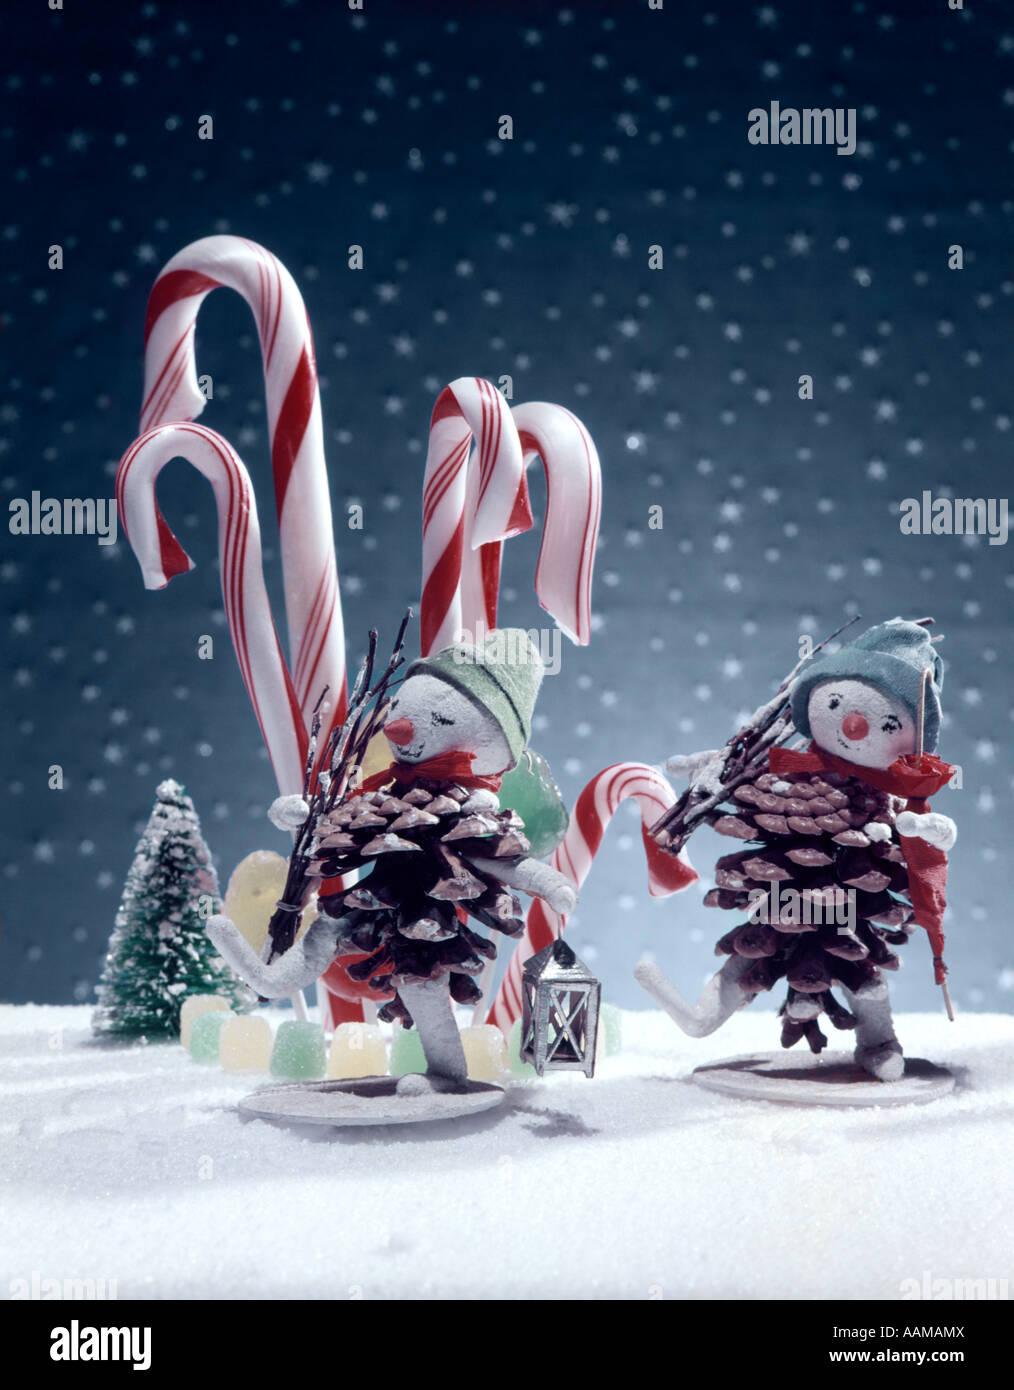 Vintage Christmas Decorations 1950s.1950 1950s Retro Christmas Ornaments Candycane Pinecones